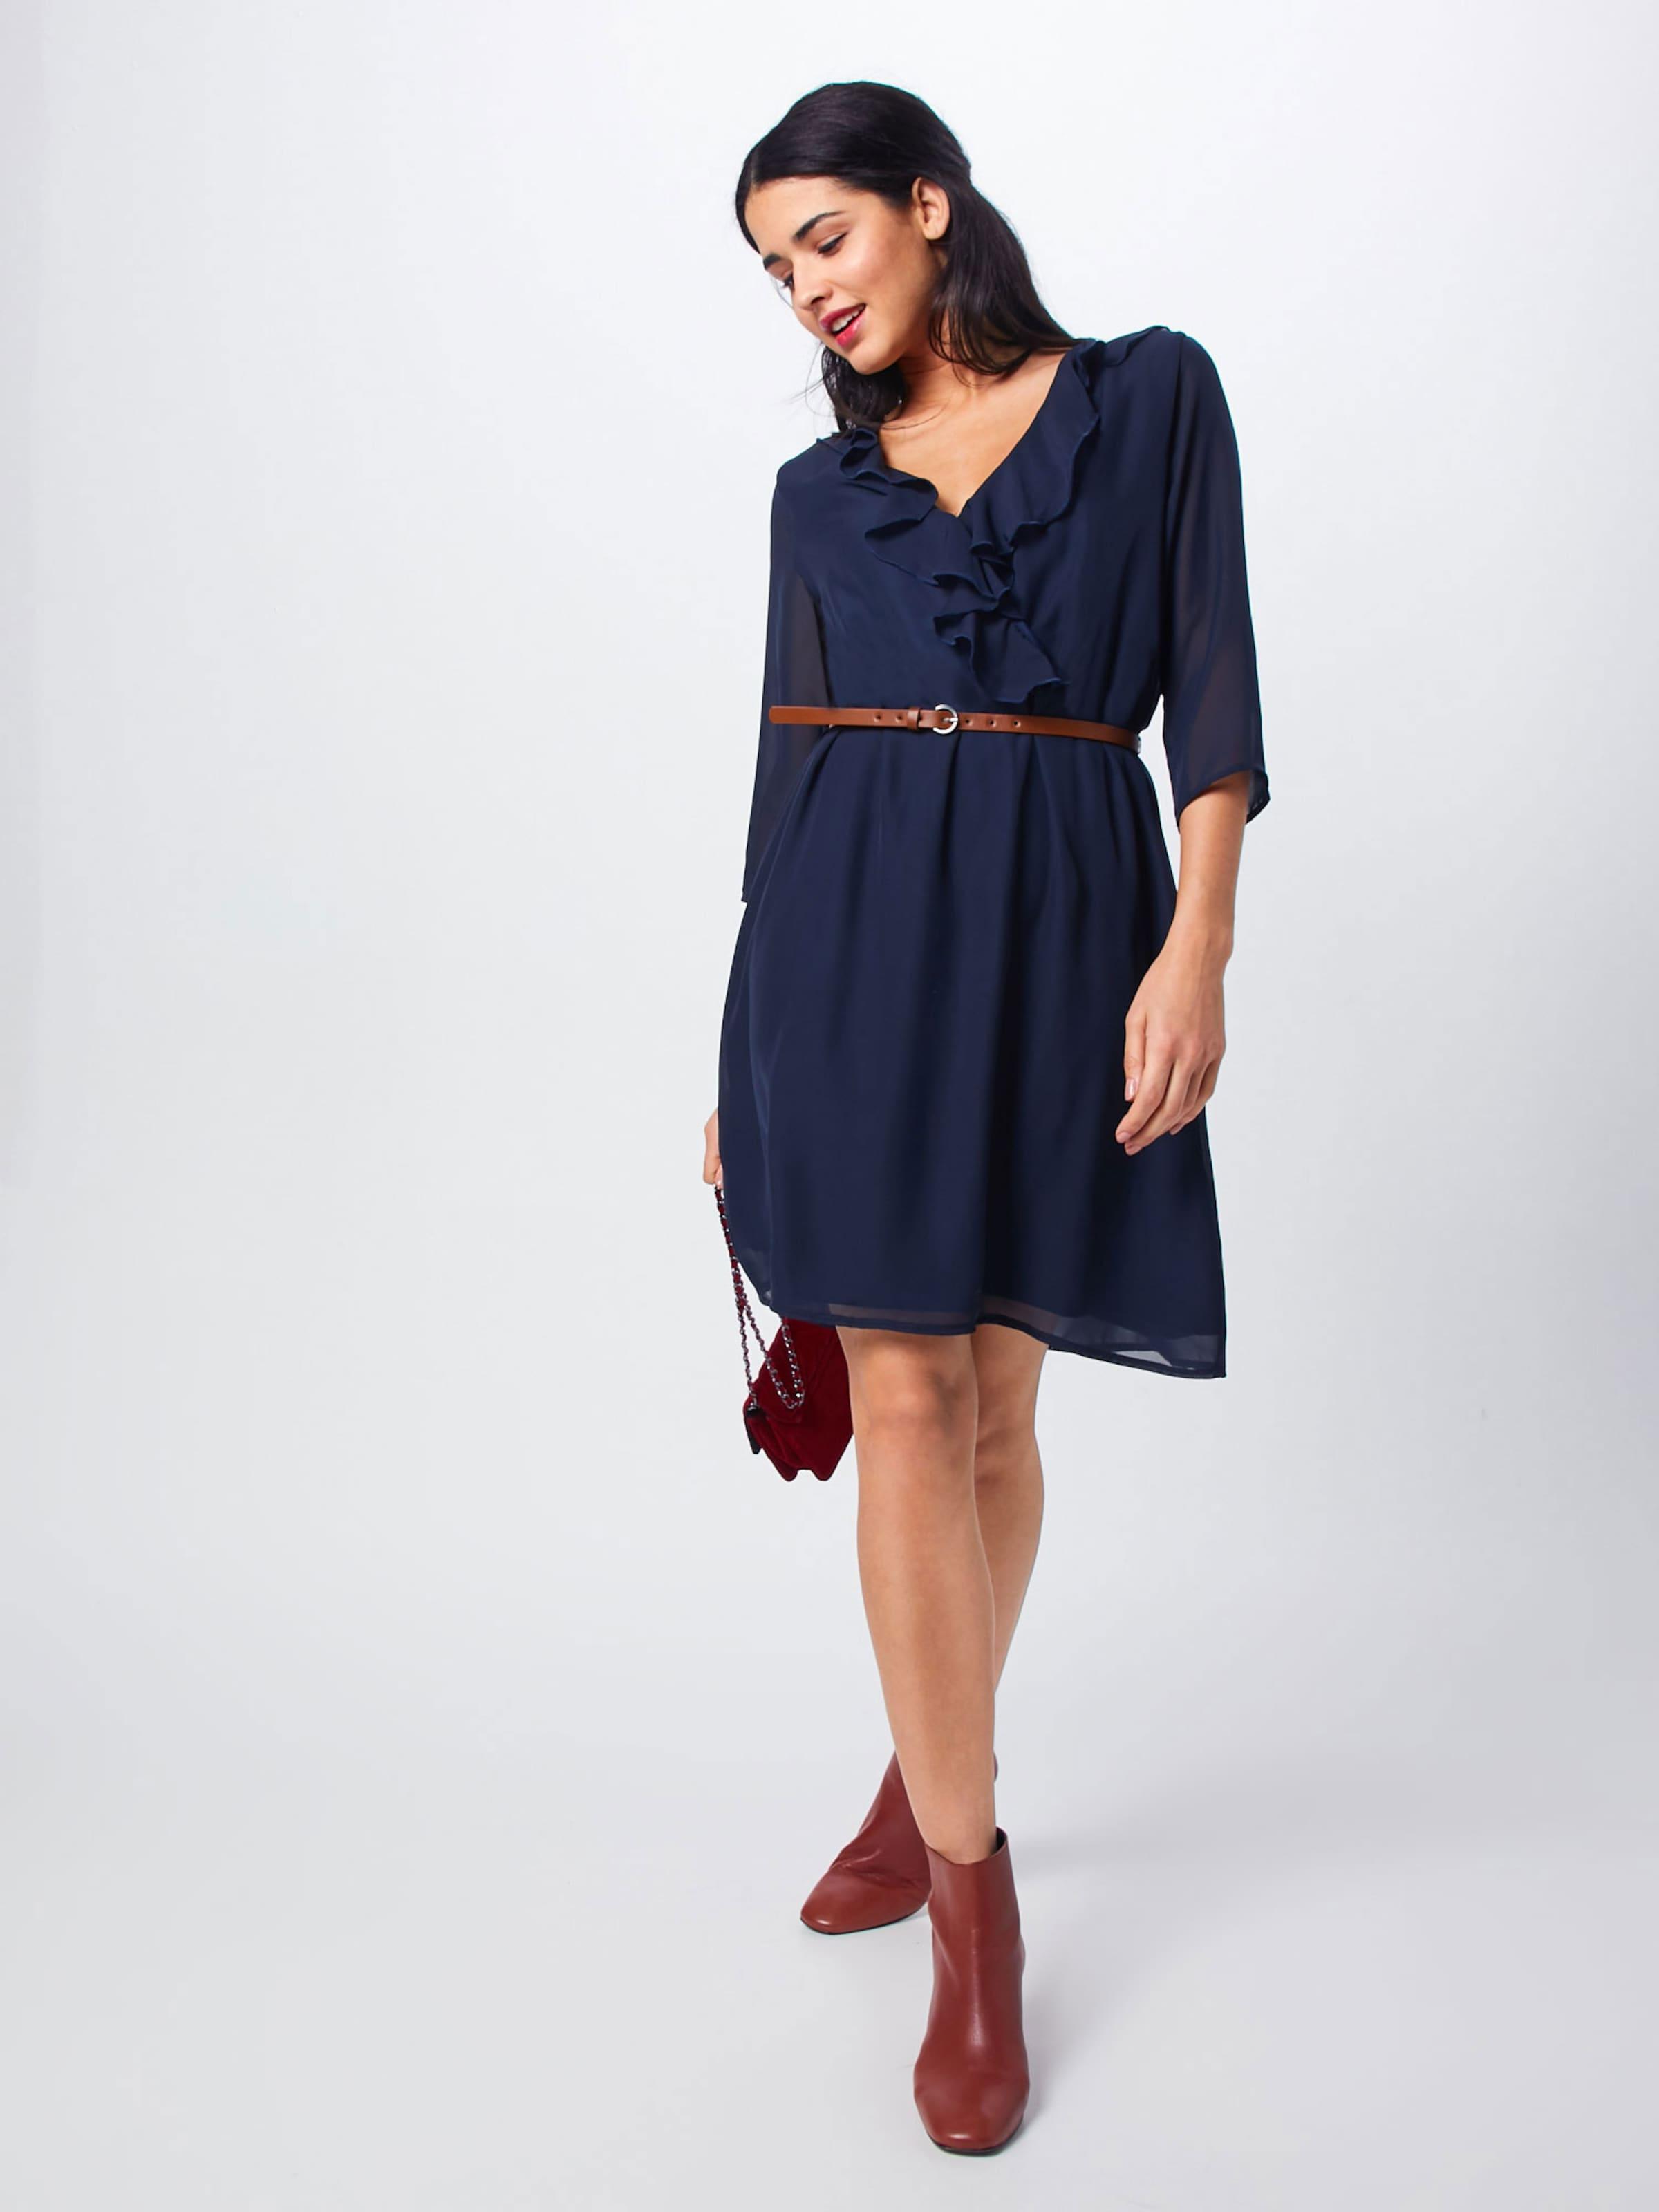 In About You 'lena Dress' Blau Kleid 3A54LRj